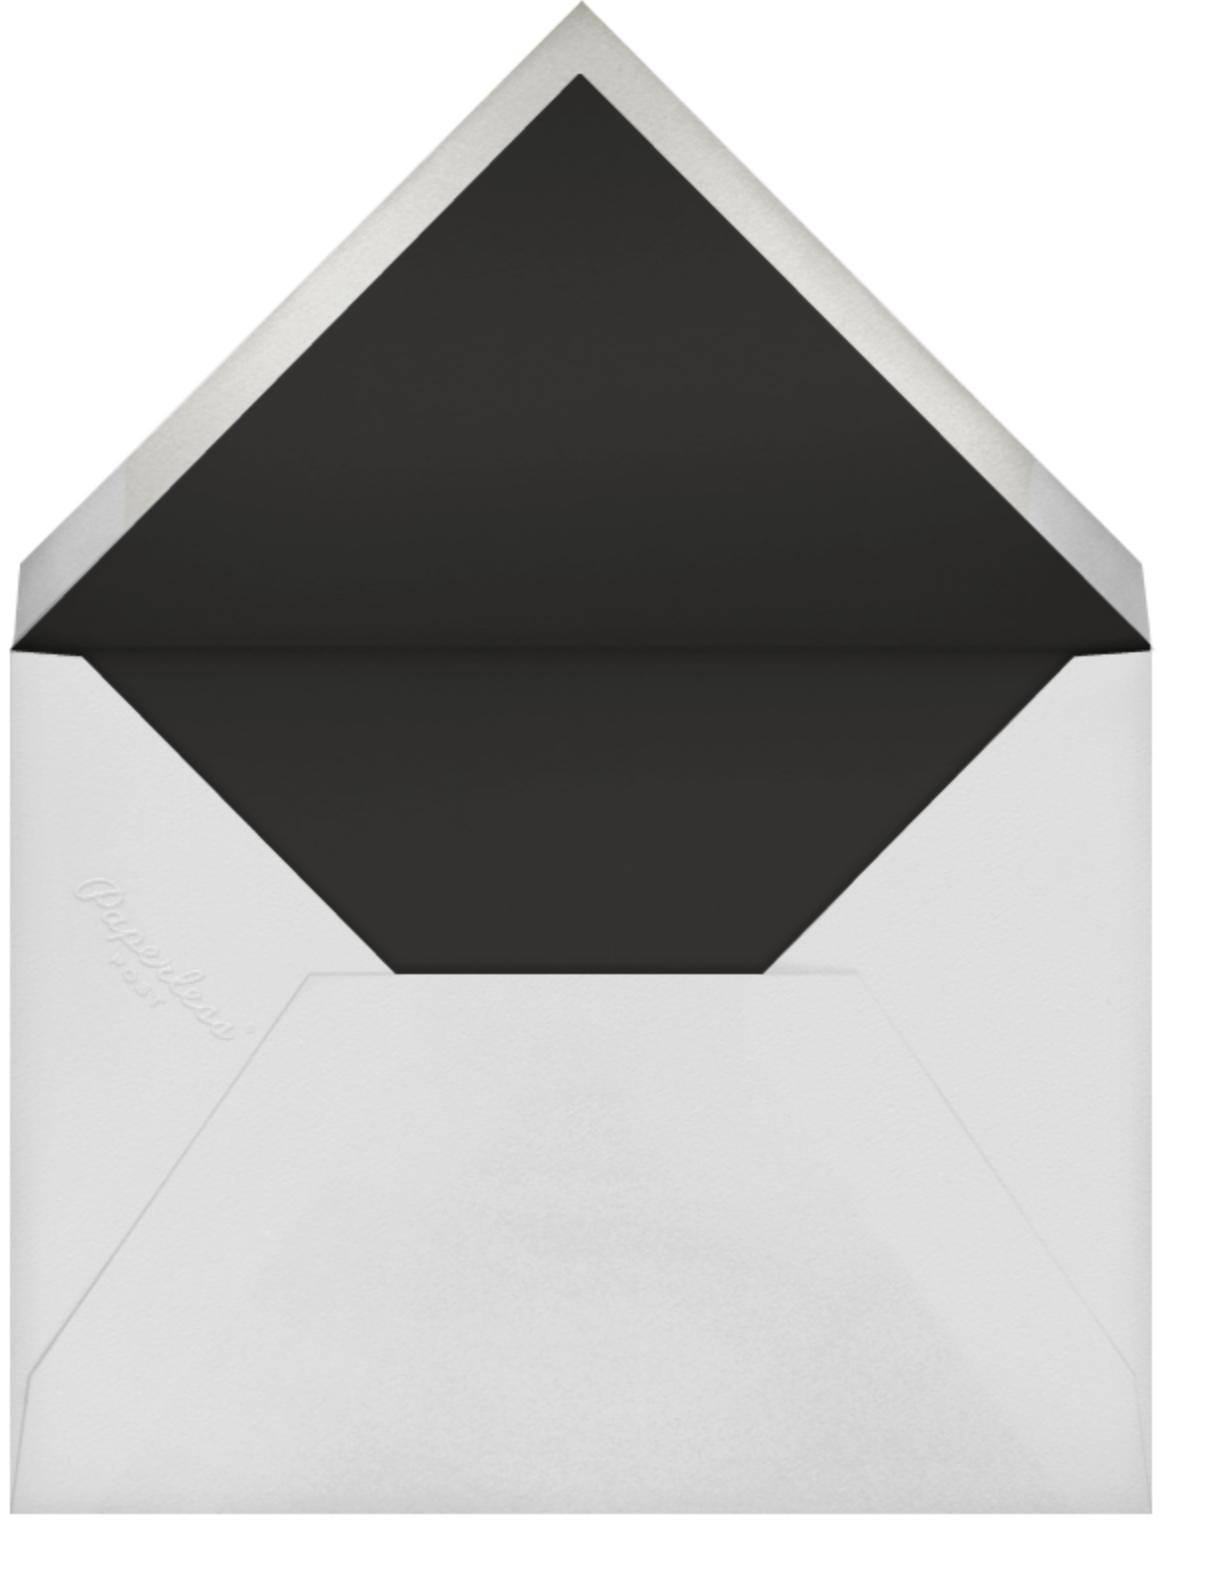 Floral Trellis II (Stationery) - Black - Oscar de la Renta - Envelope